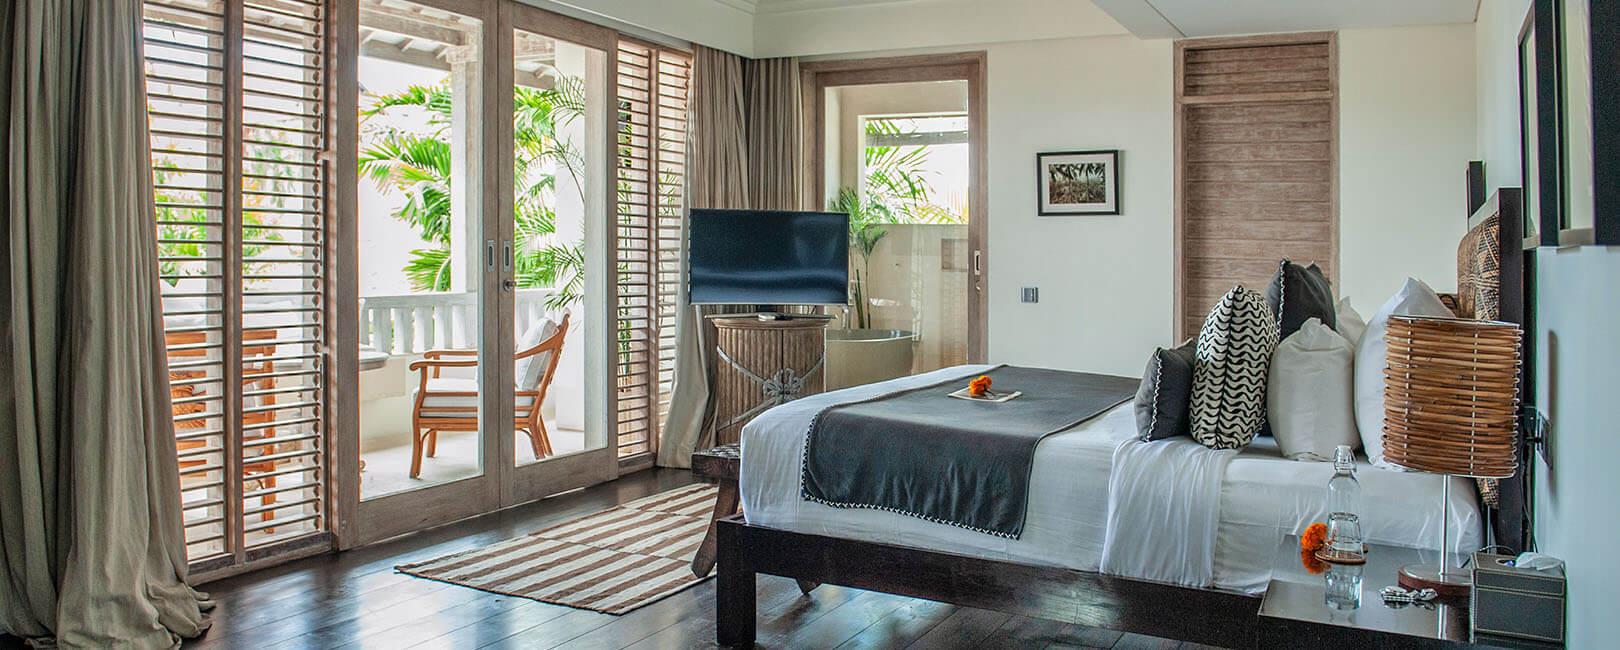 Villa Adasa - Master bedroom design